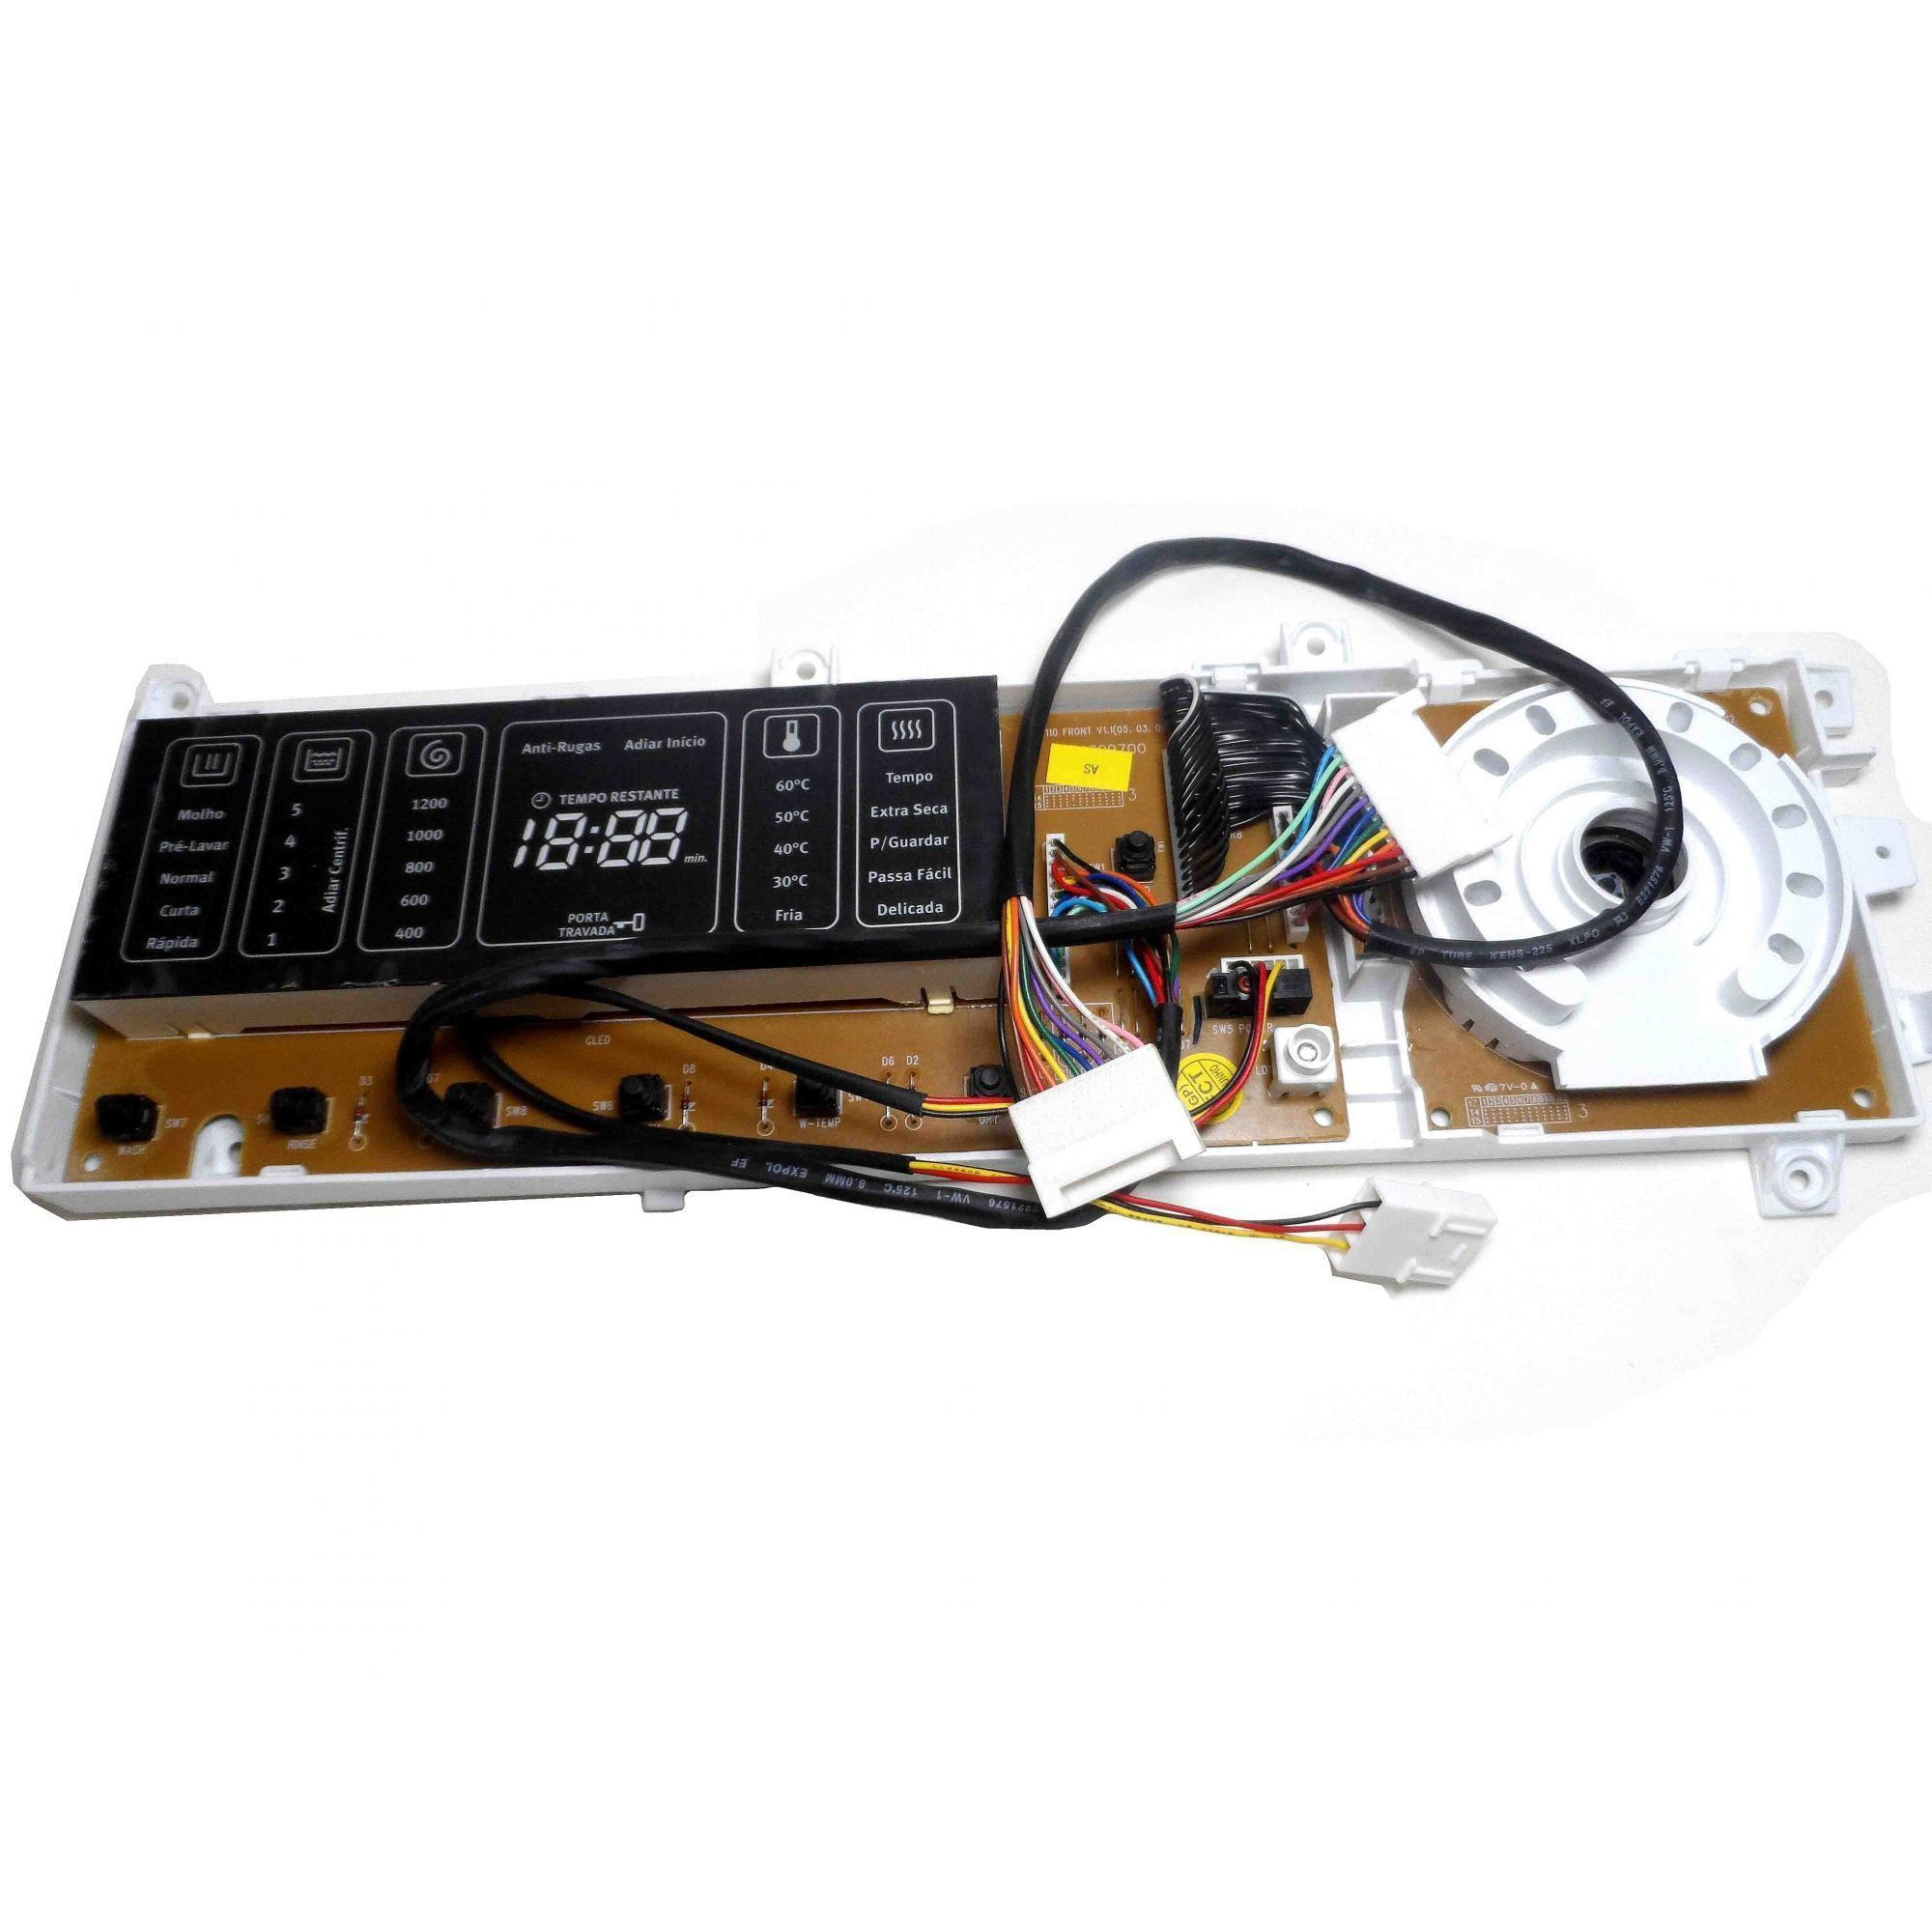 Placa Eletrônica Interface Lava Seca Electrolux PSSWID18